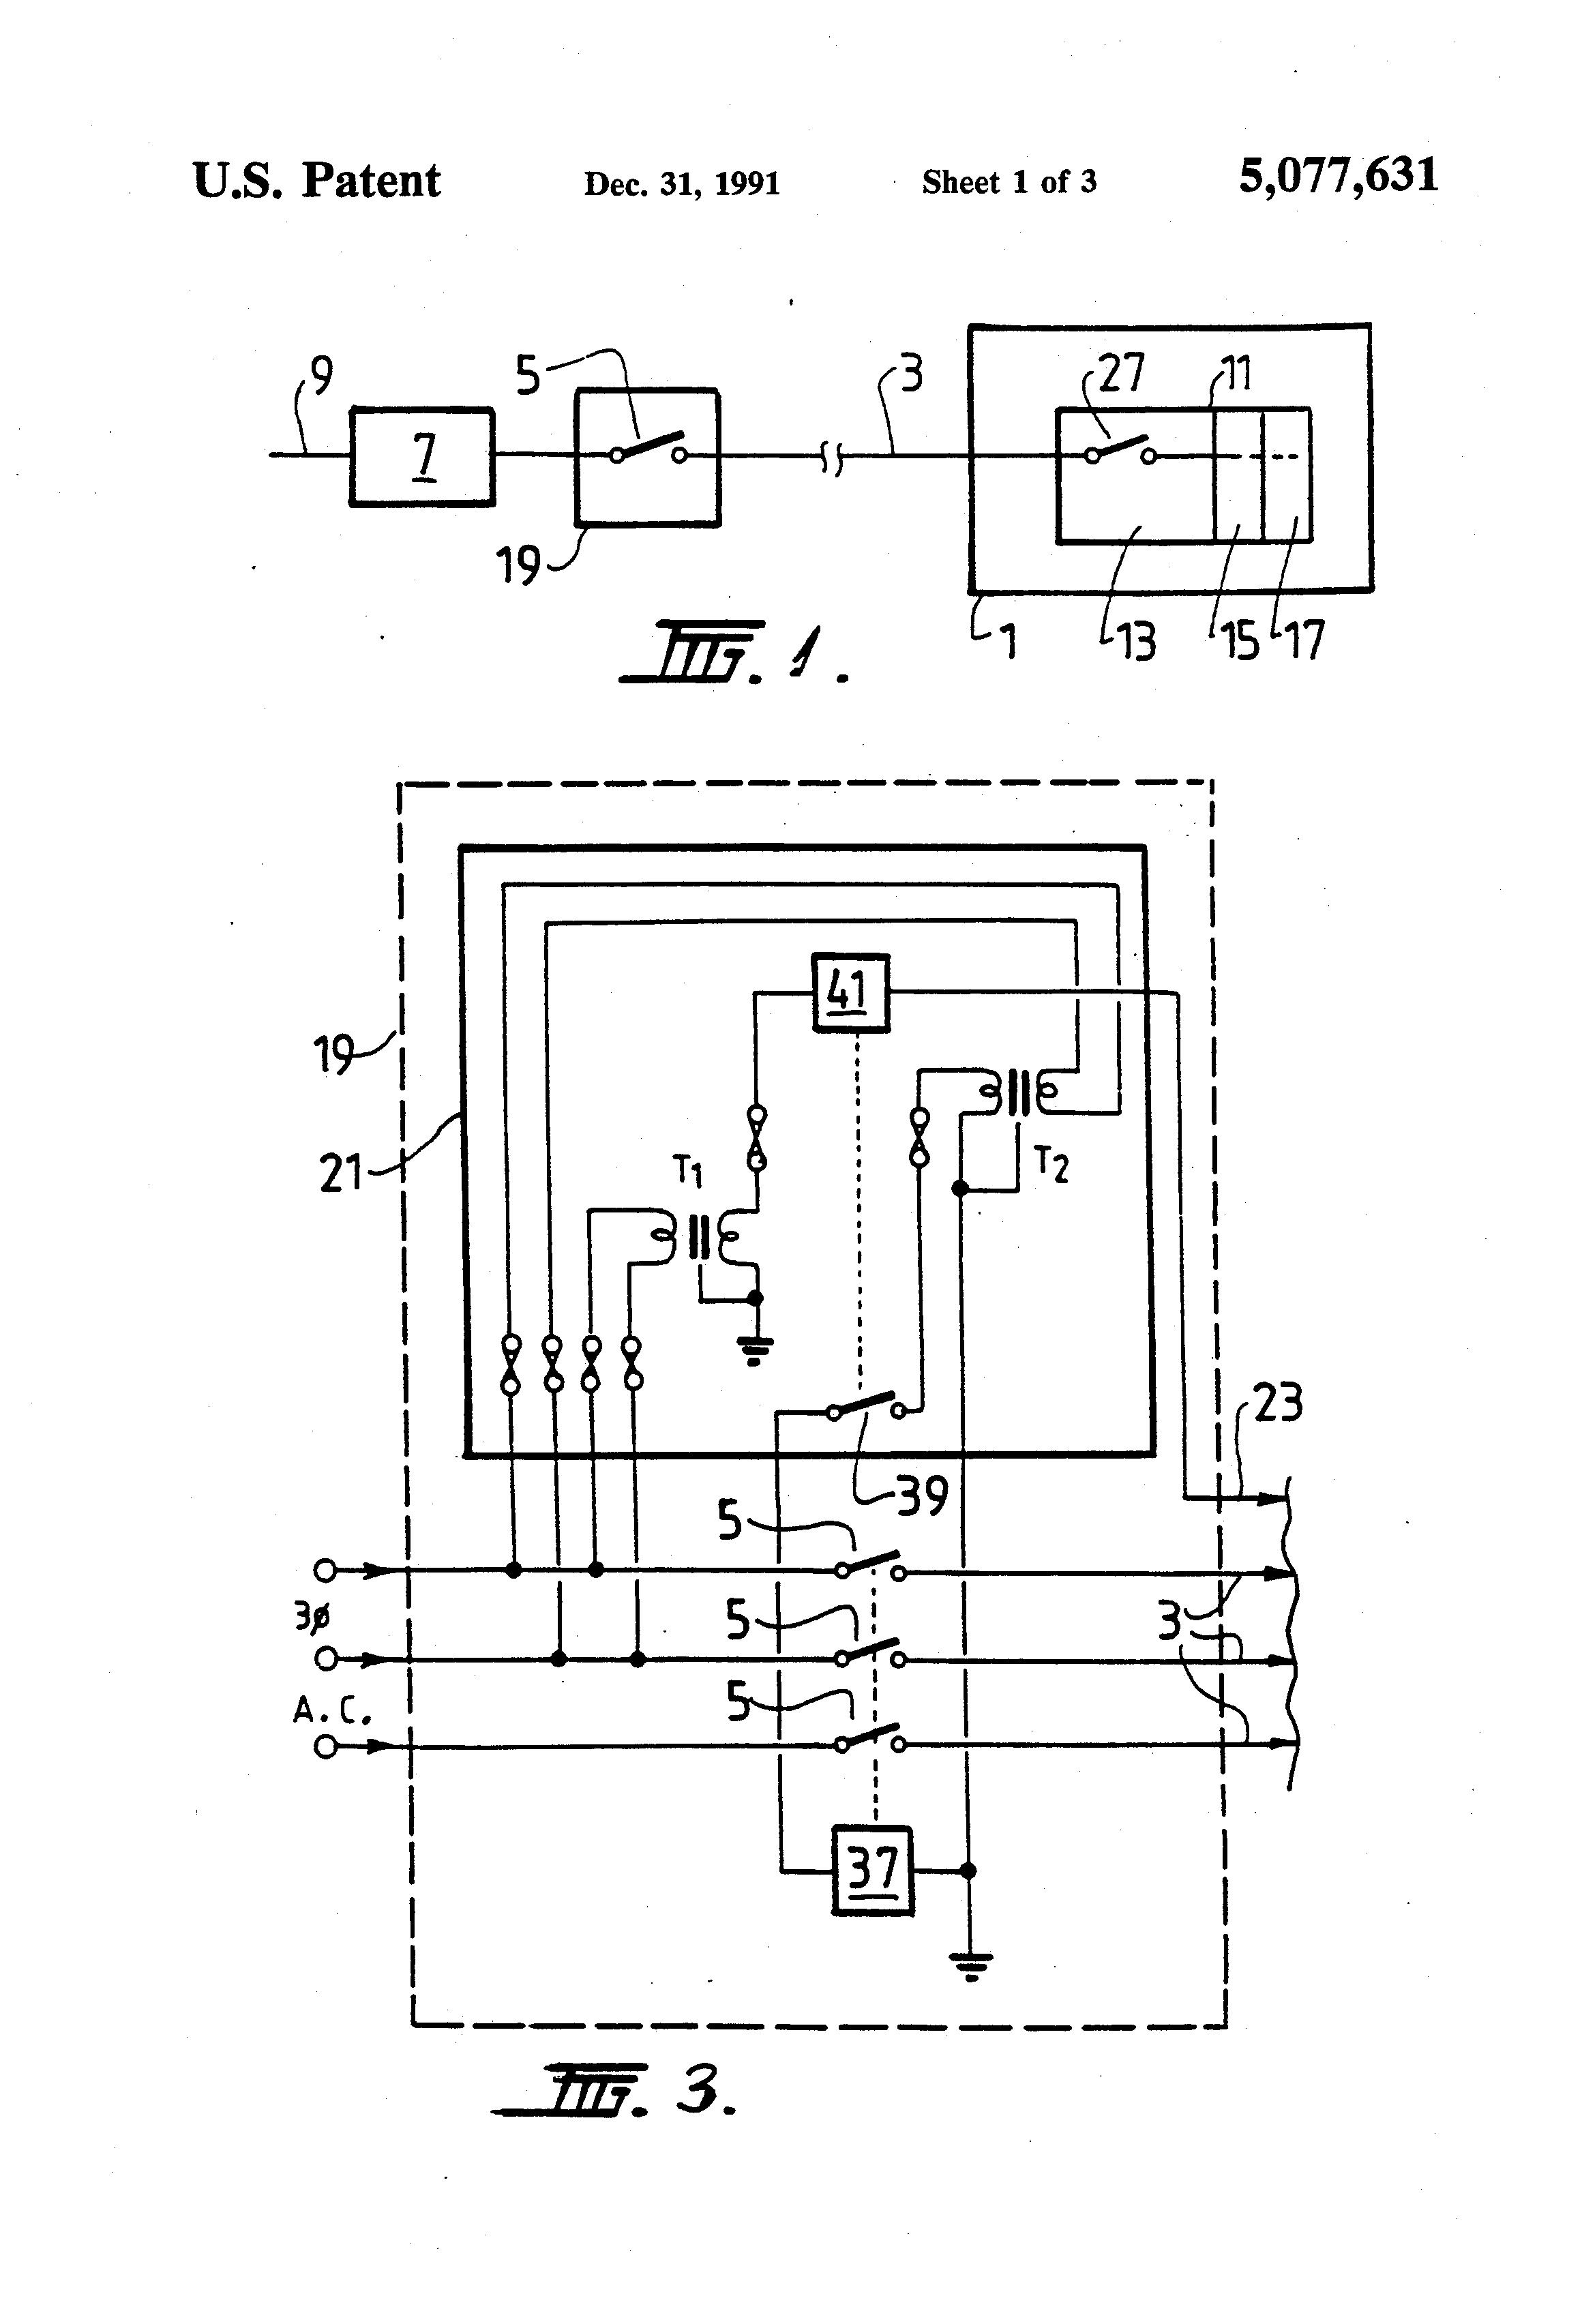 patent us5077631 - electrical door interlock system and method, Circuit diagram